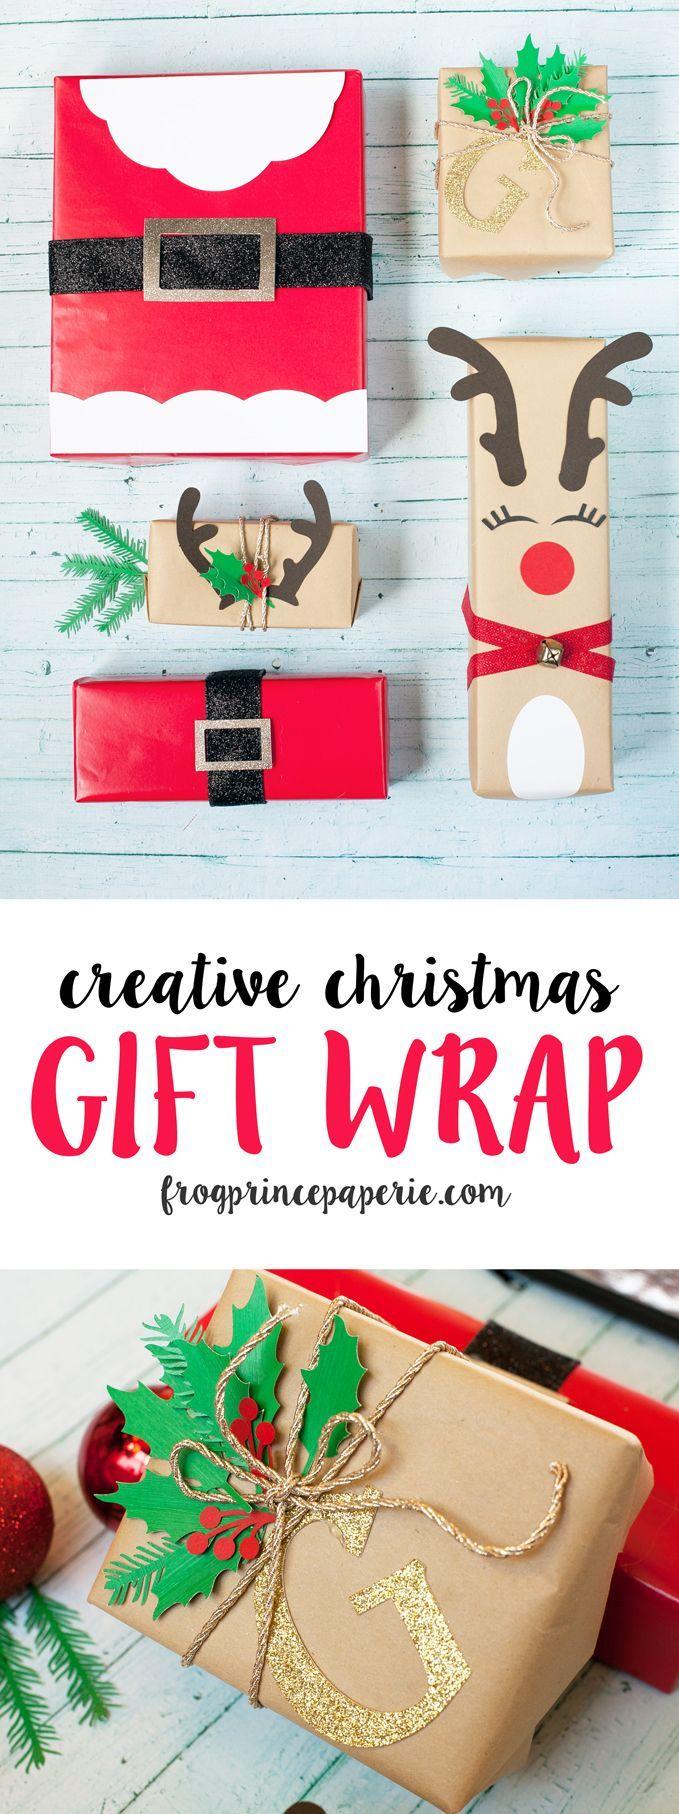 Creative Gift Wrapping with Cricut Explore #cricutholiday #giftwrap #christmas #...